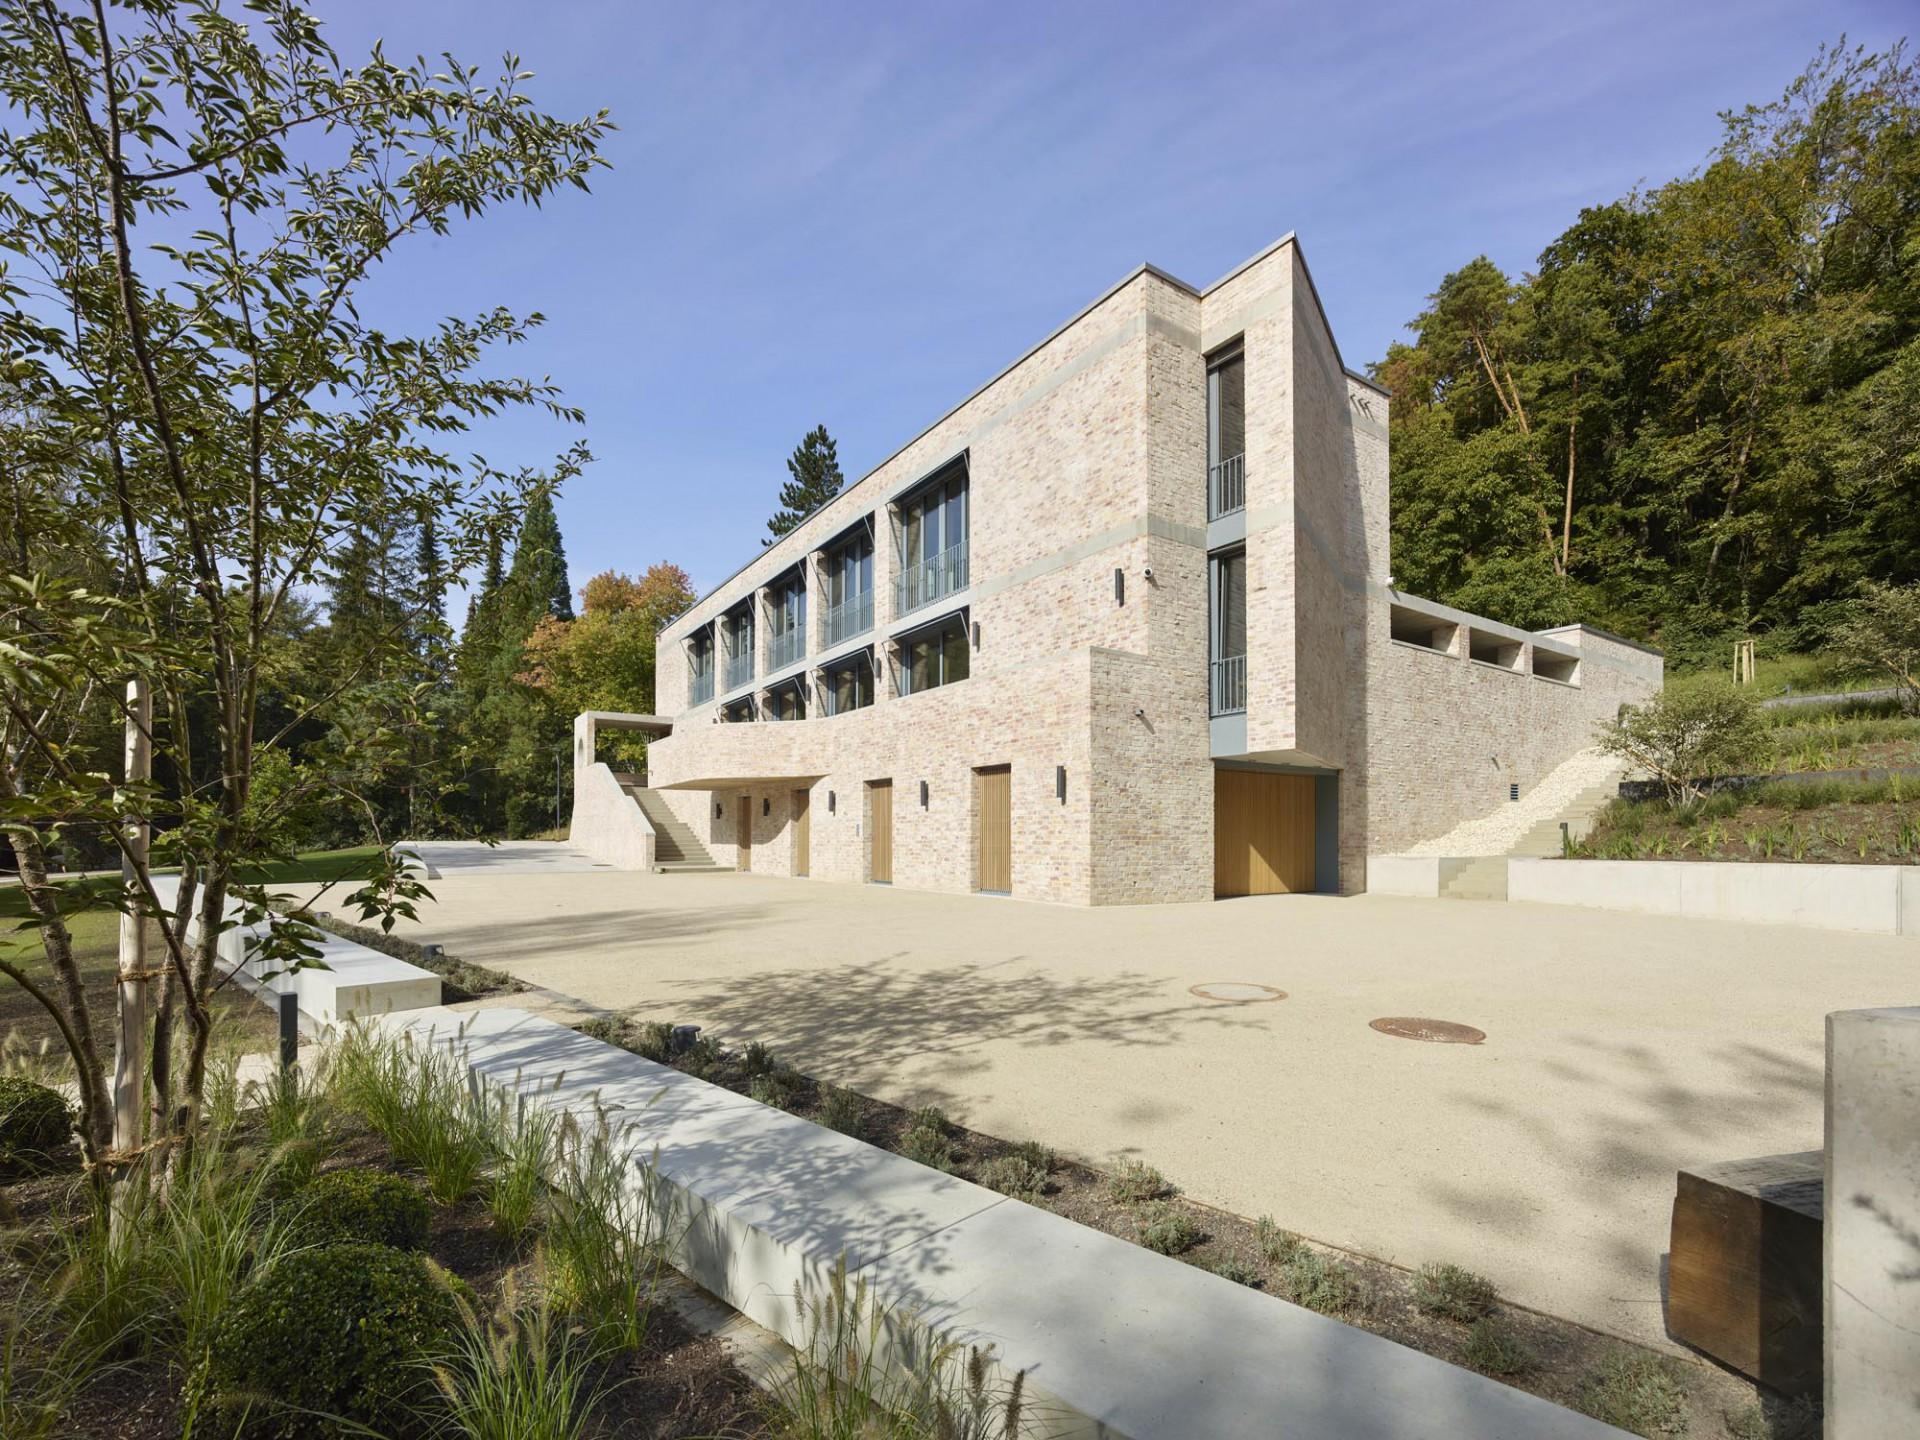 House Engel on the Swabian Alb